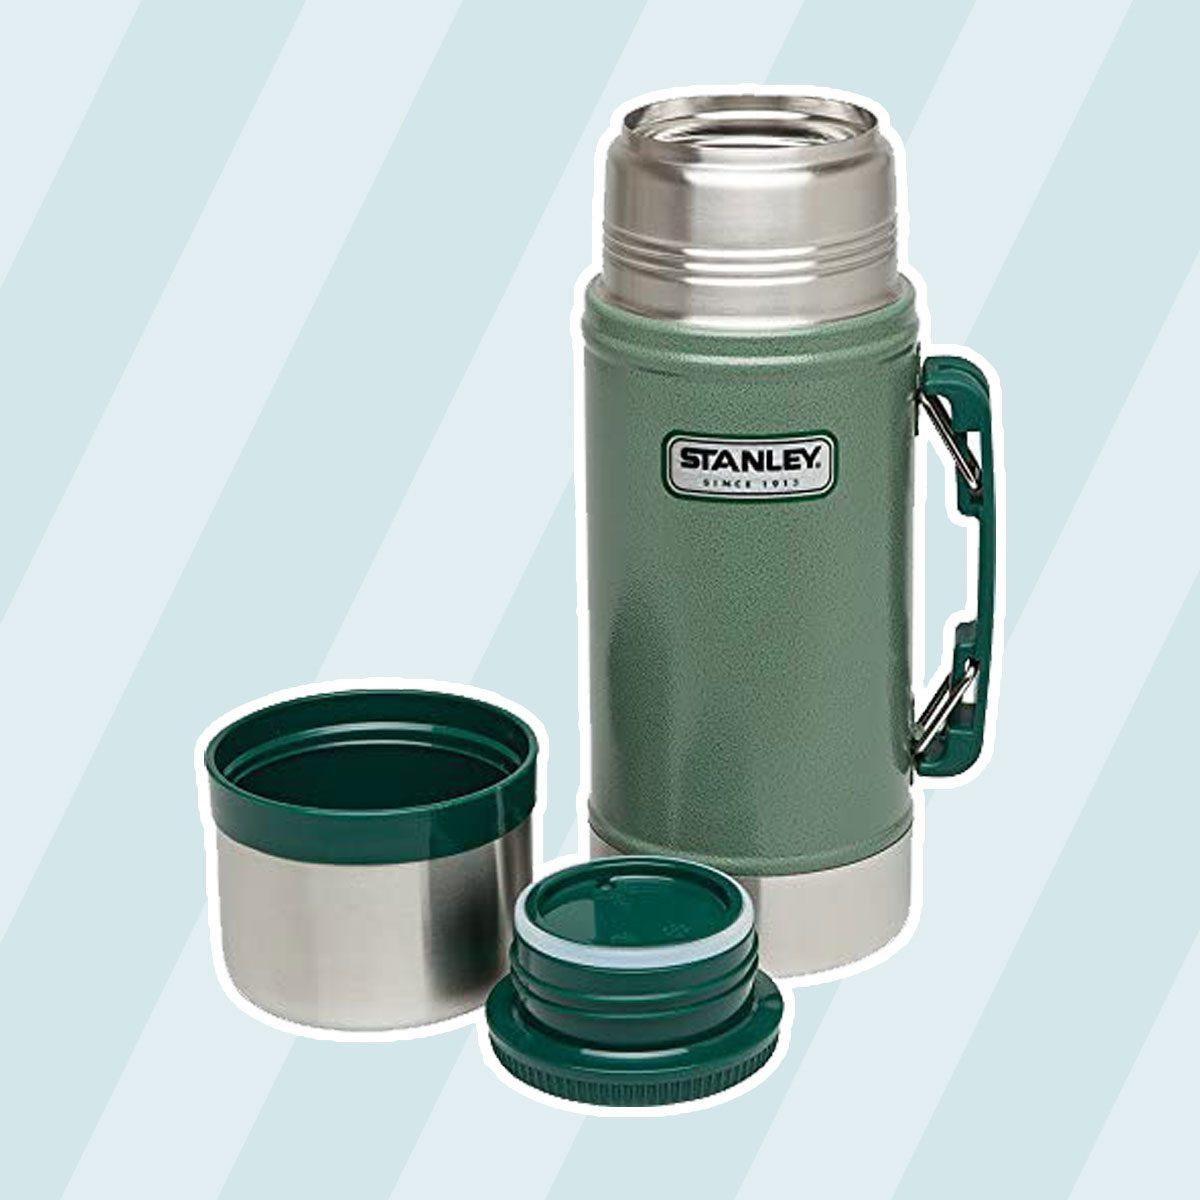 Stanley Classic Legendary Vacuum Insulated Food Jar